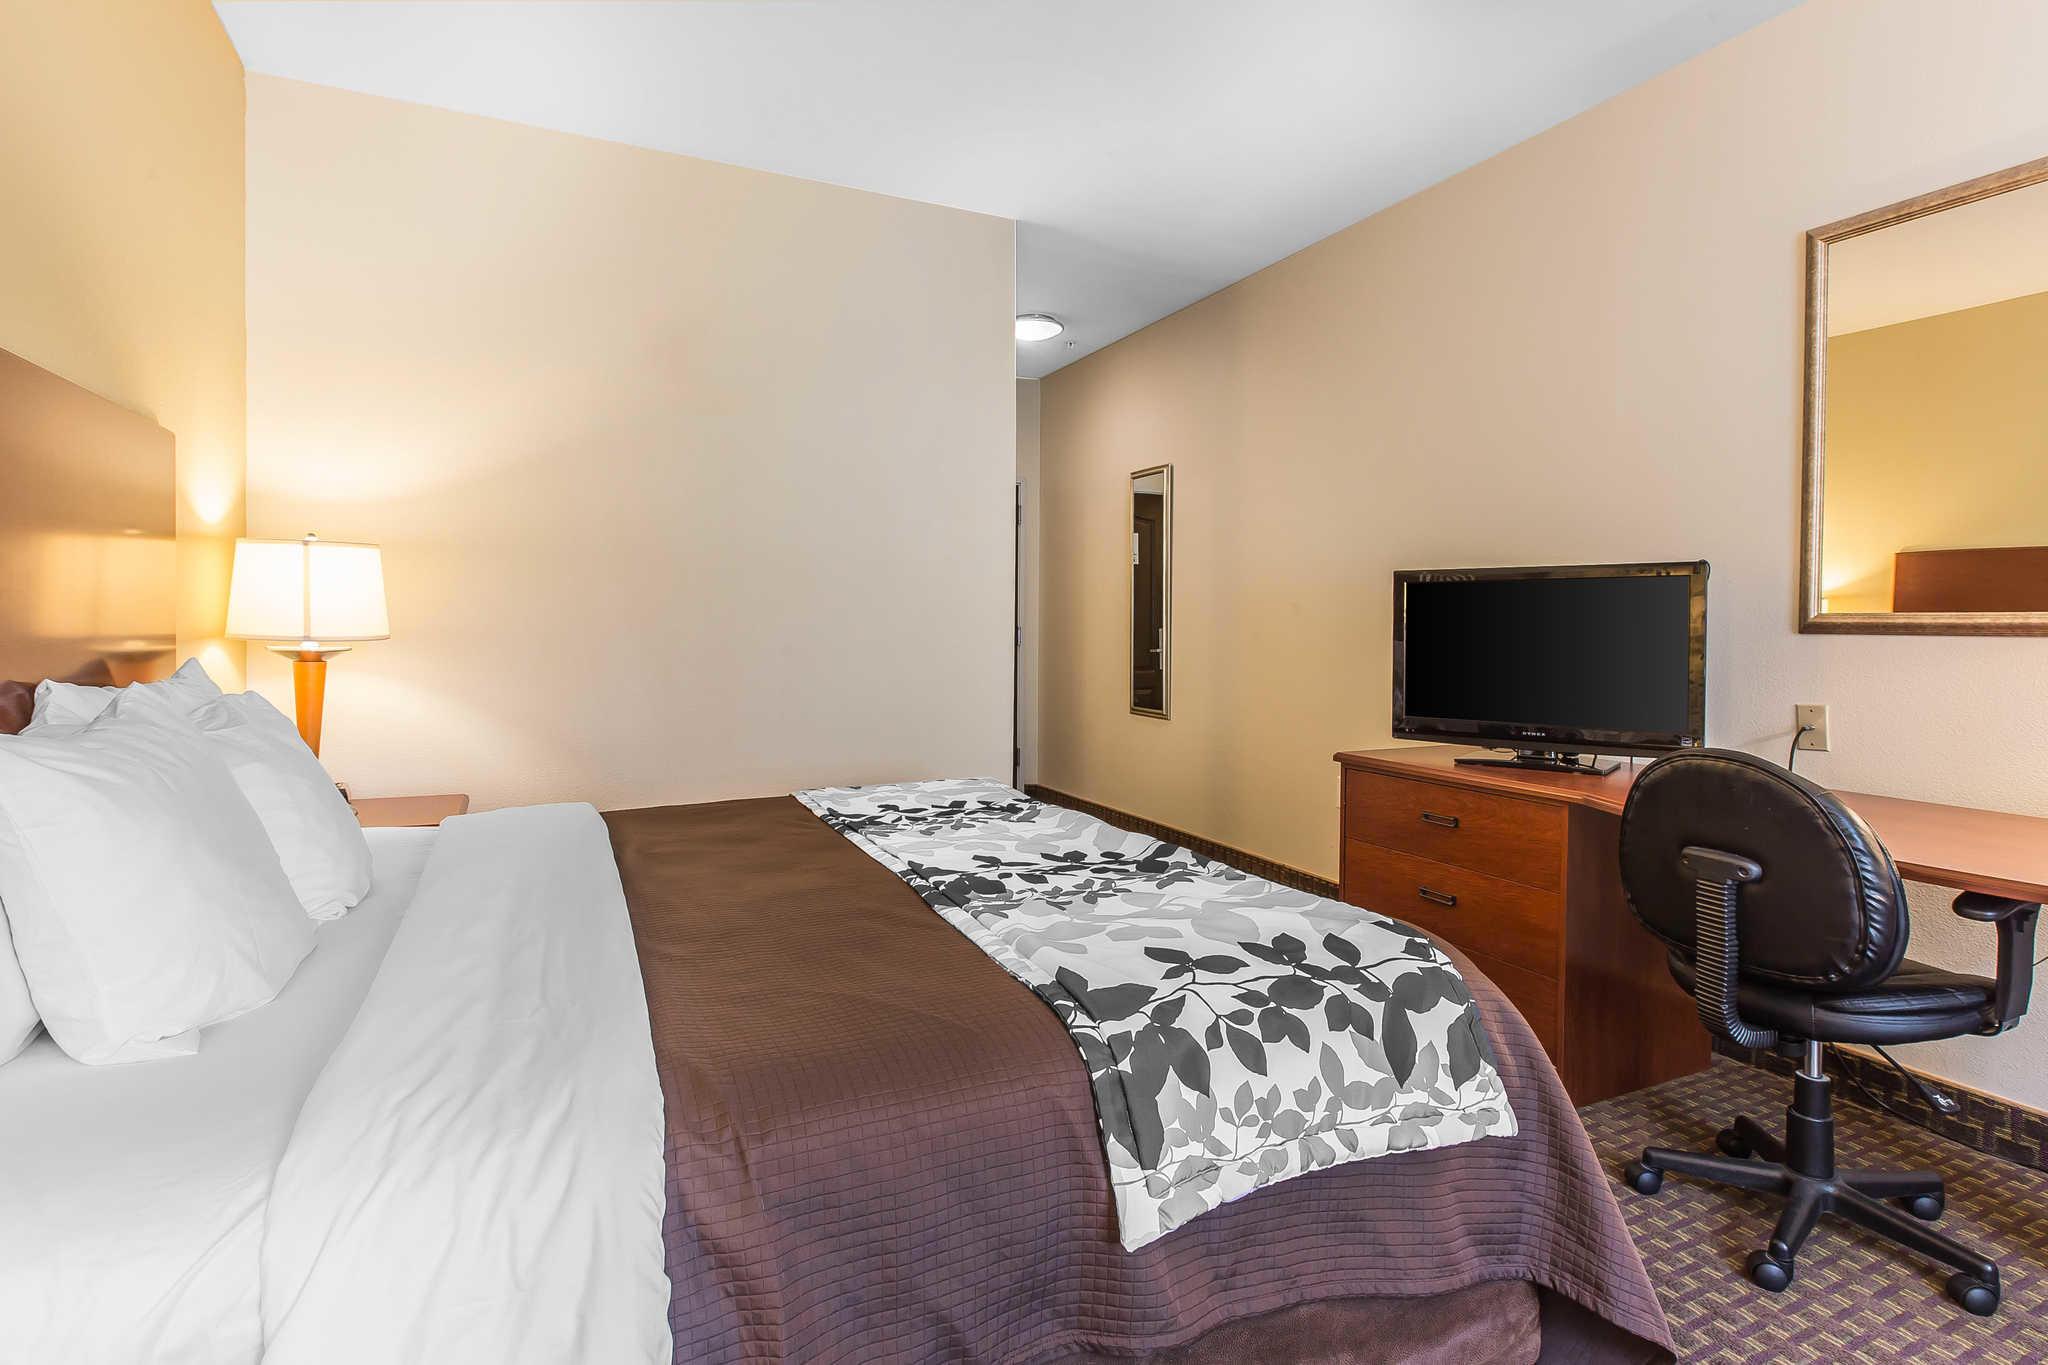 Sleep Inn & Suites At Kennesaw State University image 9